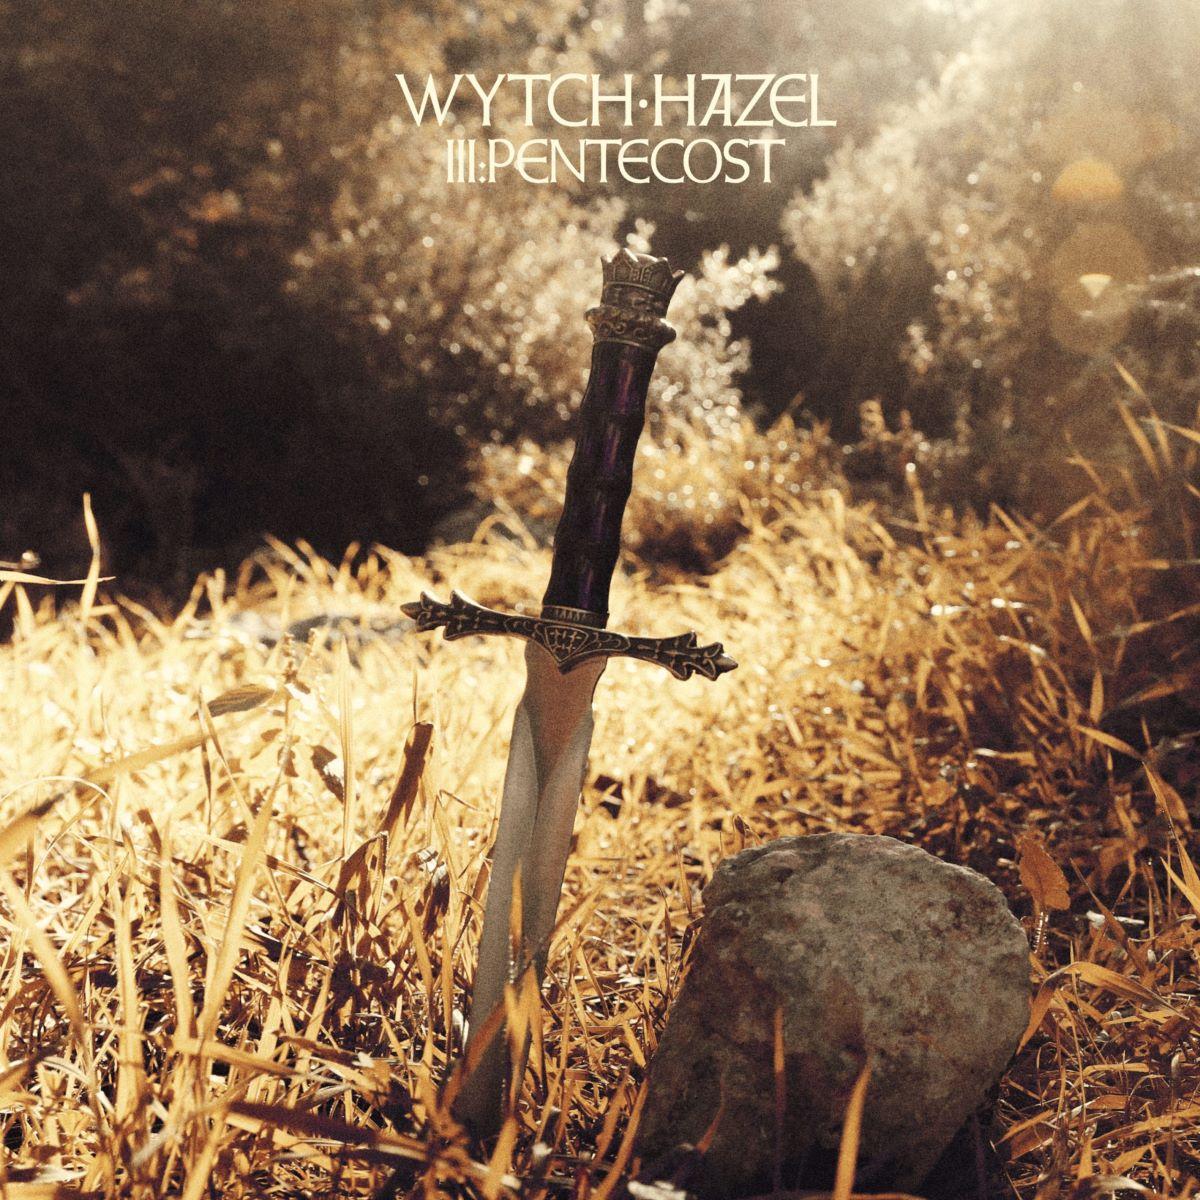 wytch hazel- III pentecost - album cover